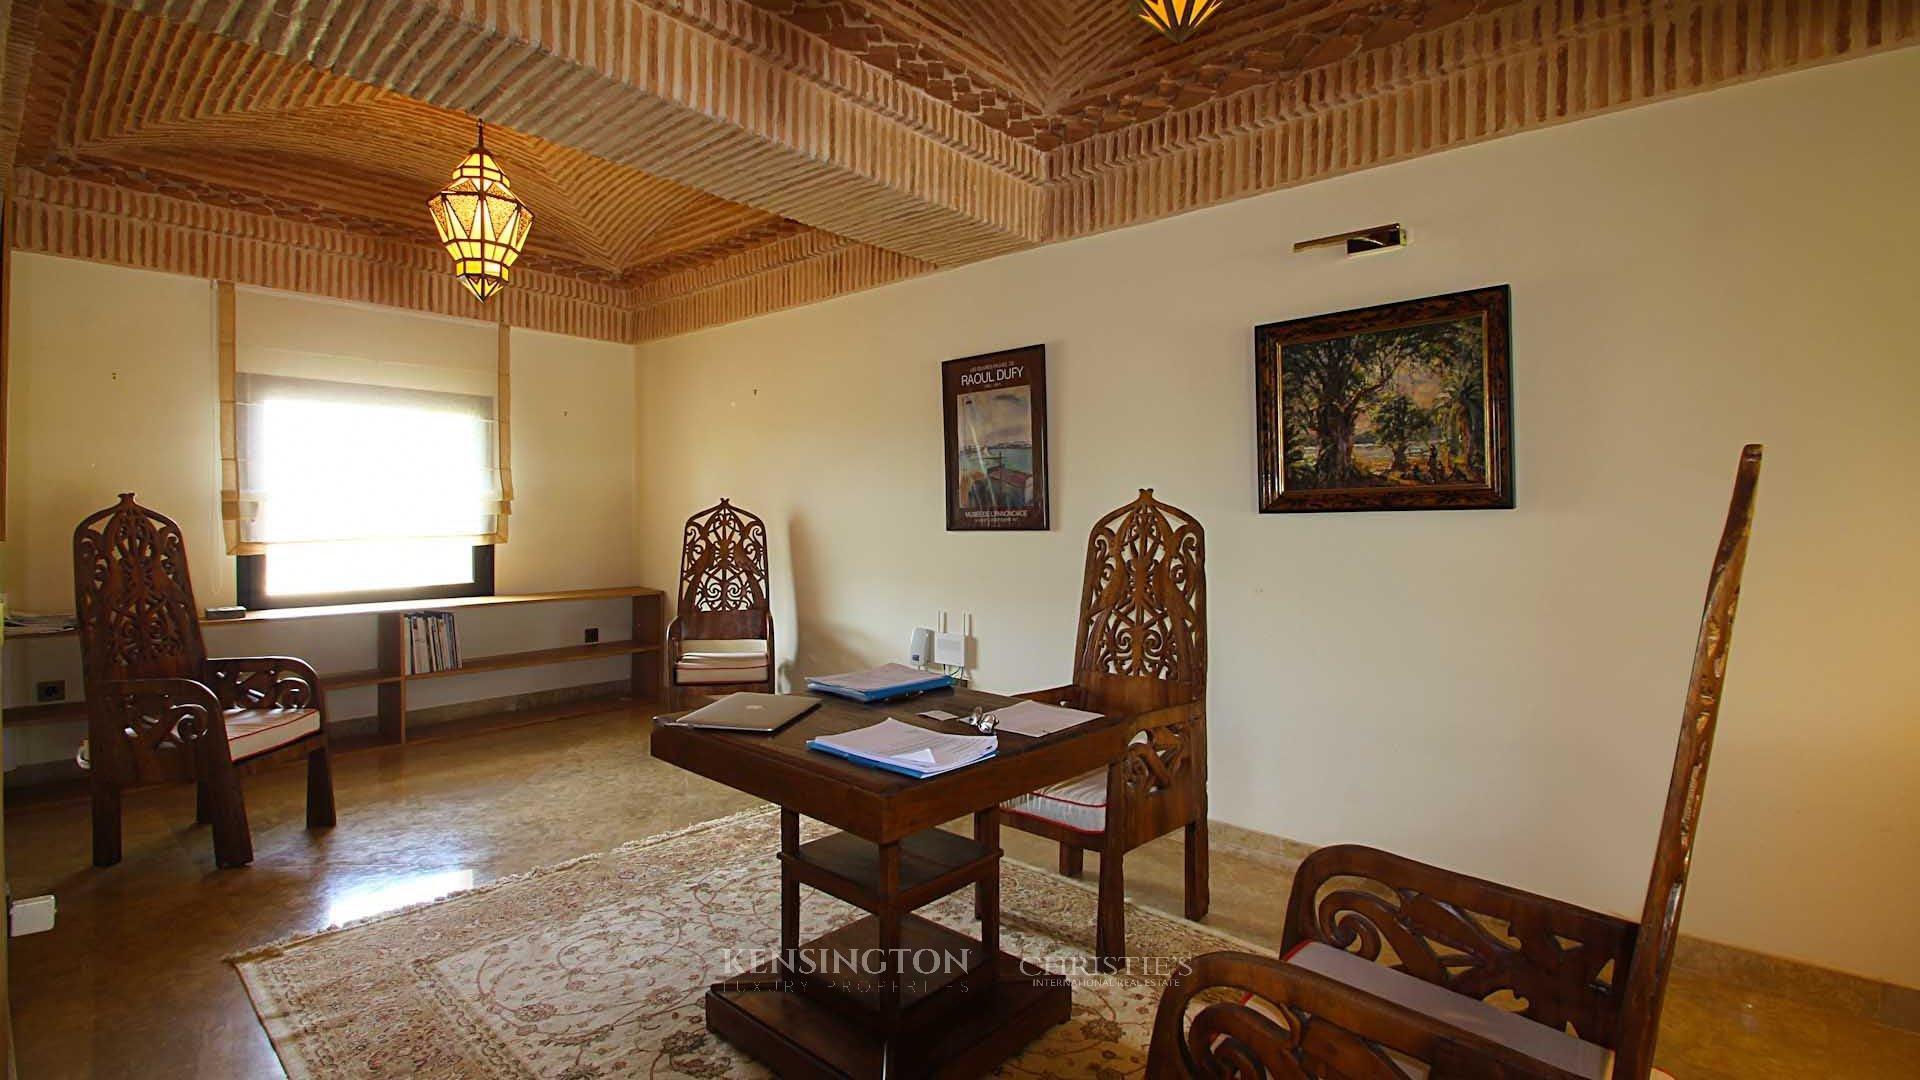 KPPM01075: Villa Jana Villa de luxe Marrakech Maroc